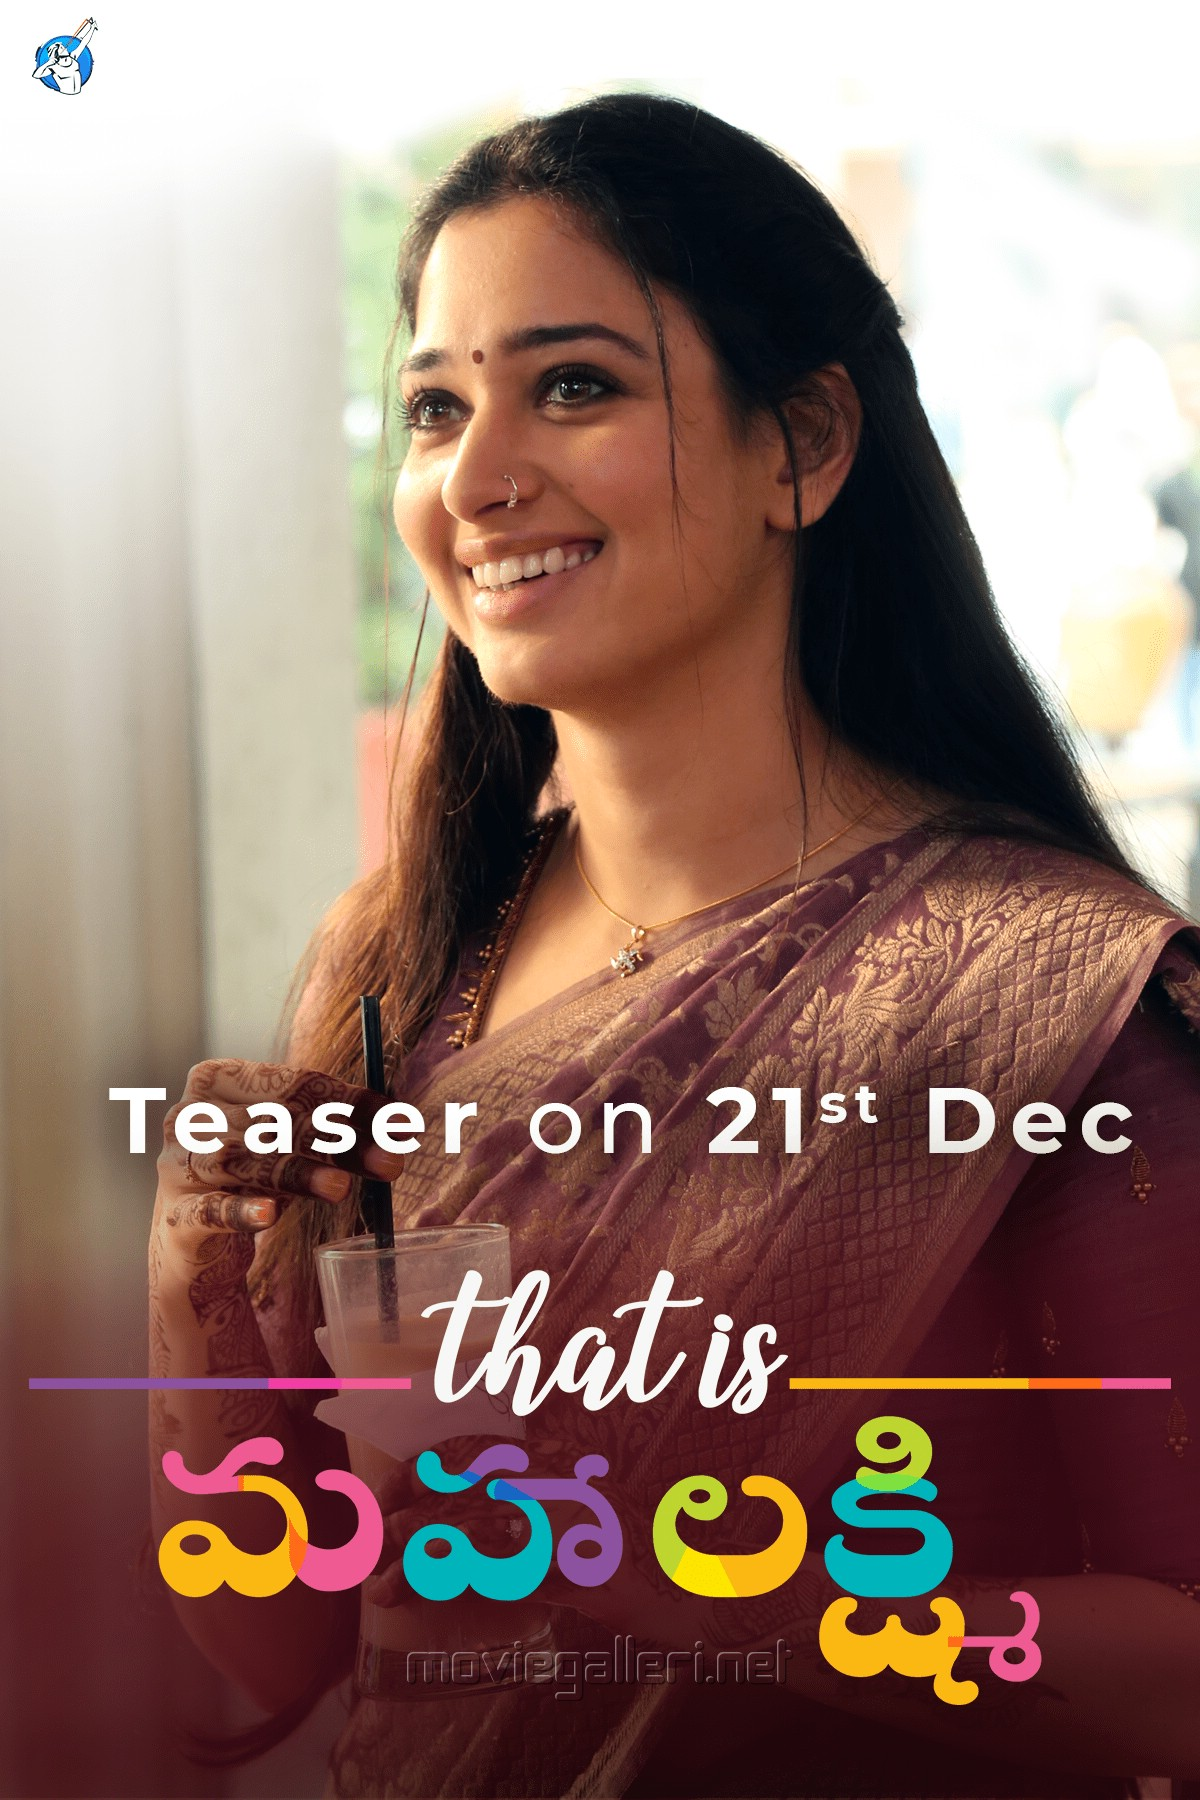 Actress Tamanna That is Mahalakshmi Teaser on Dec 21st Poster HD